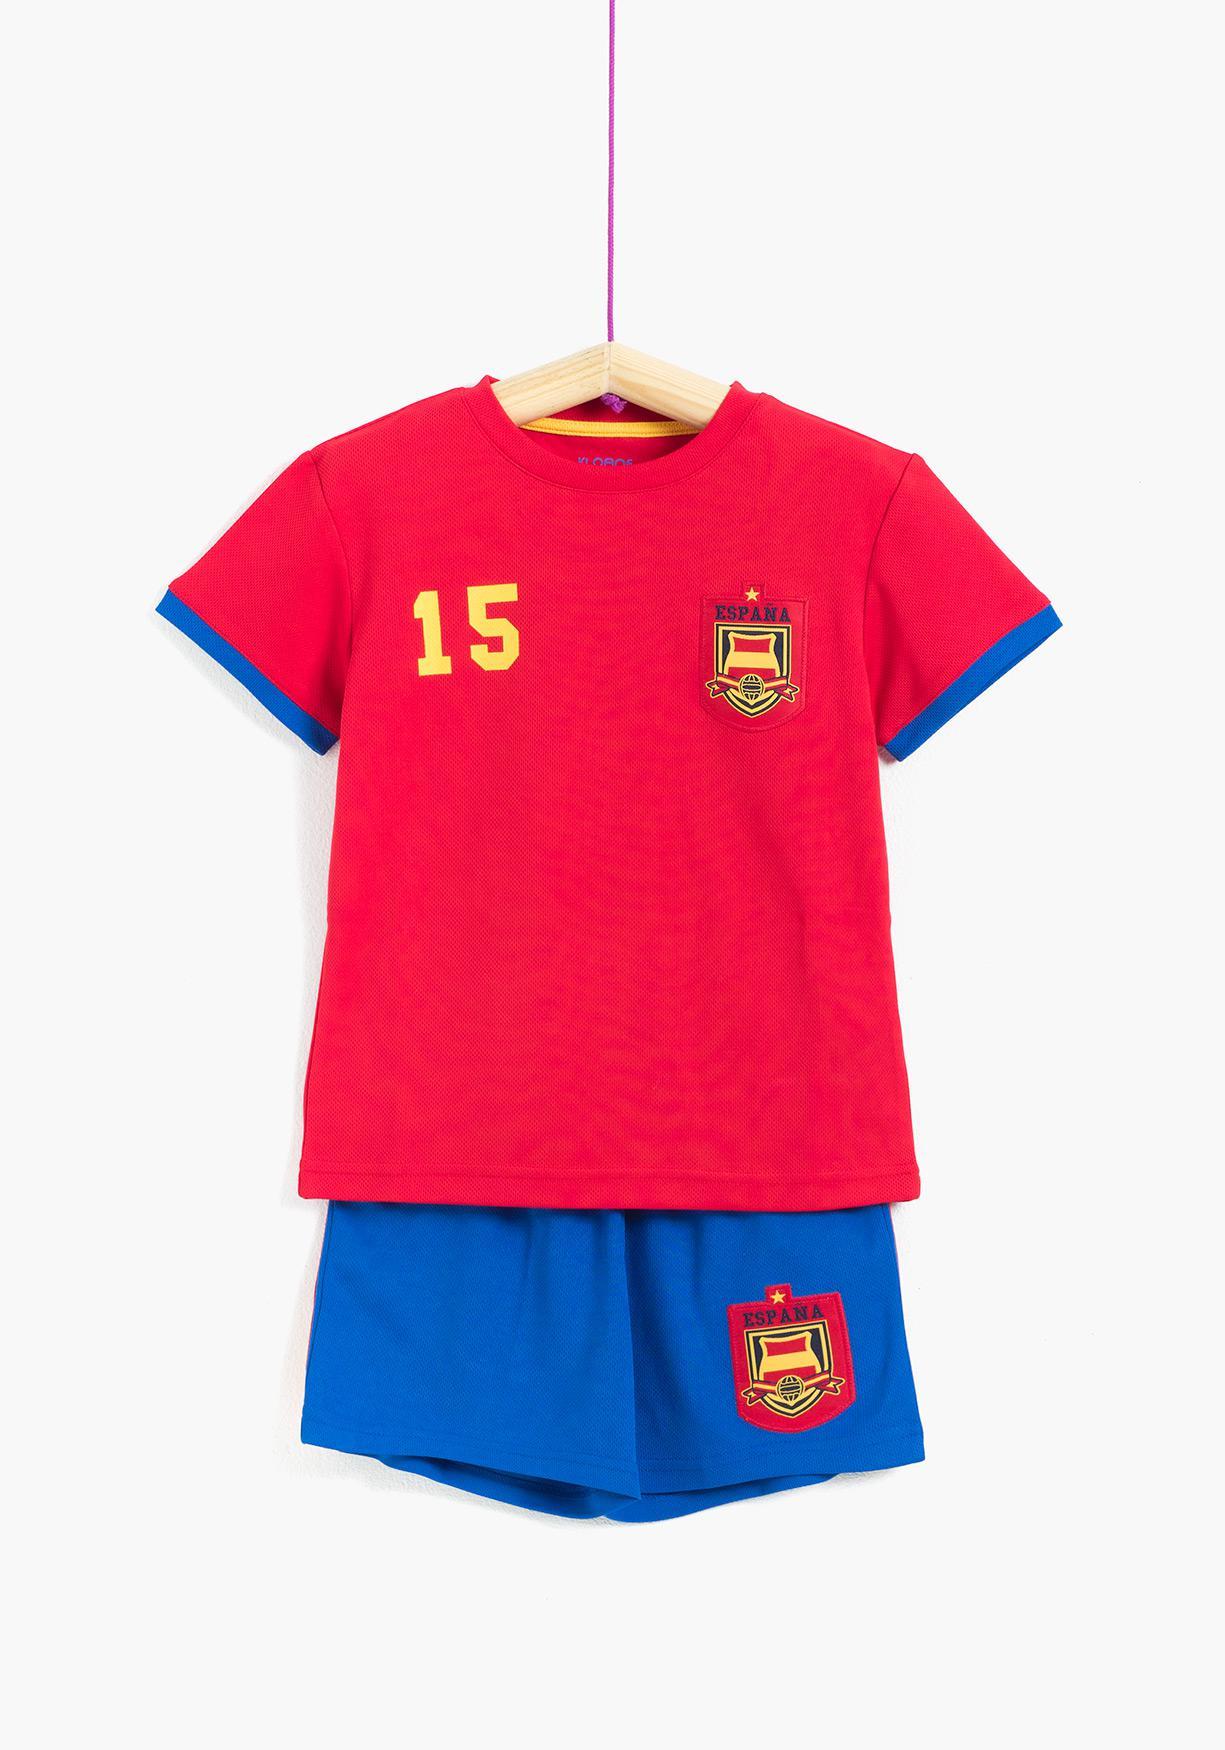 b08b6e4432561 Comprar Equipación unisex de fútbol España. ¡Aprovéchate de nuestros ...